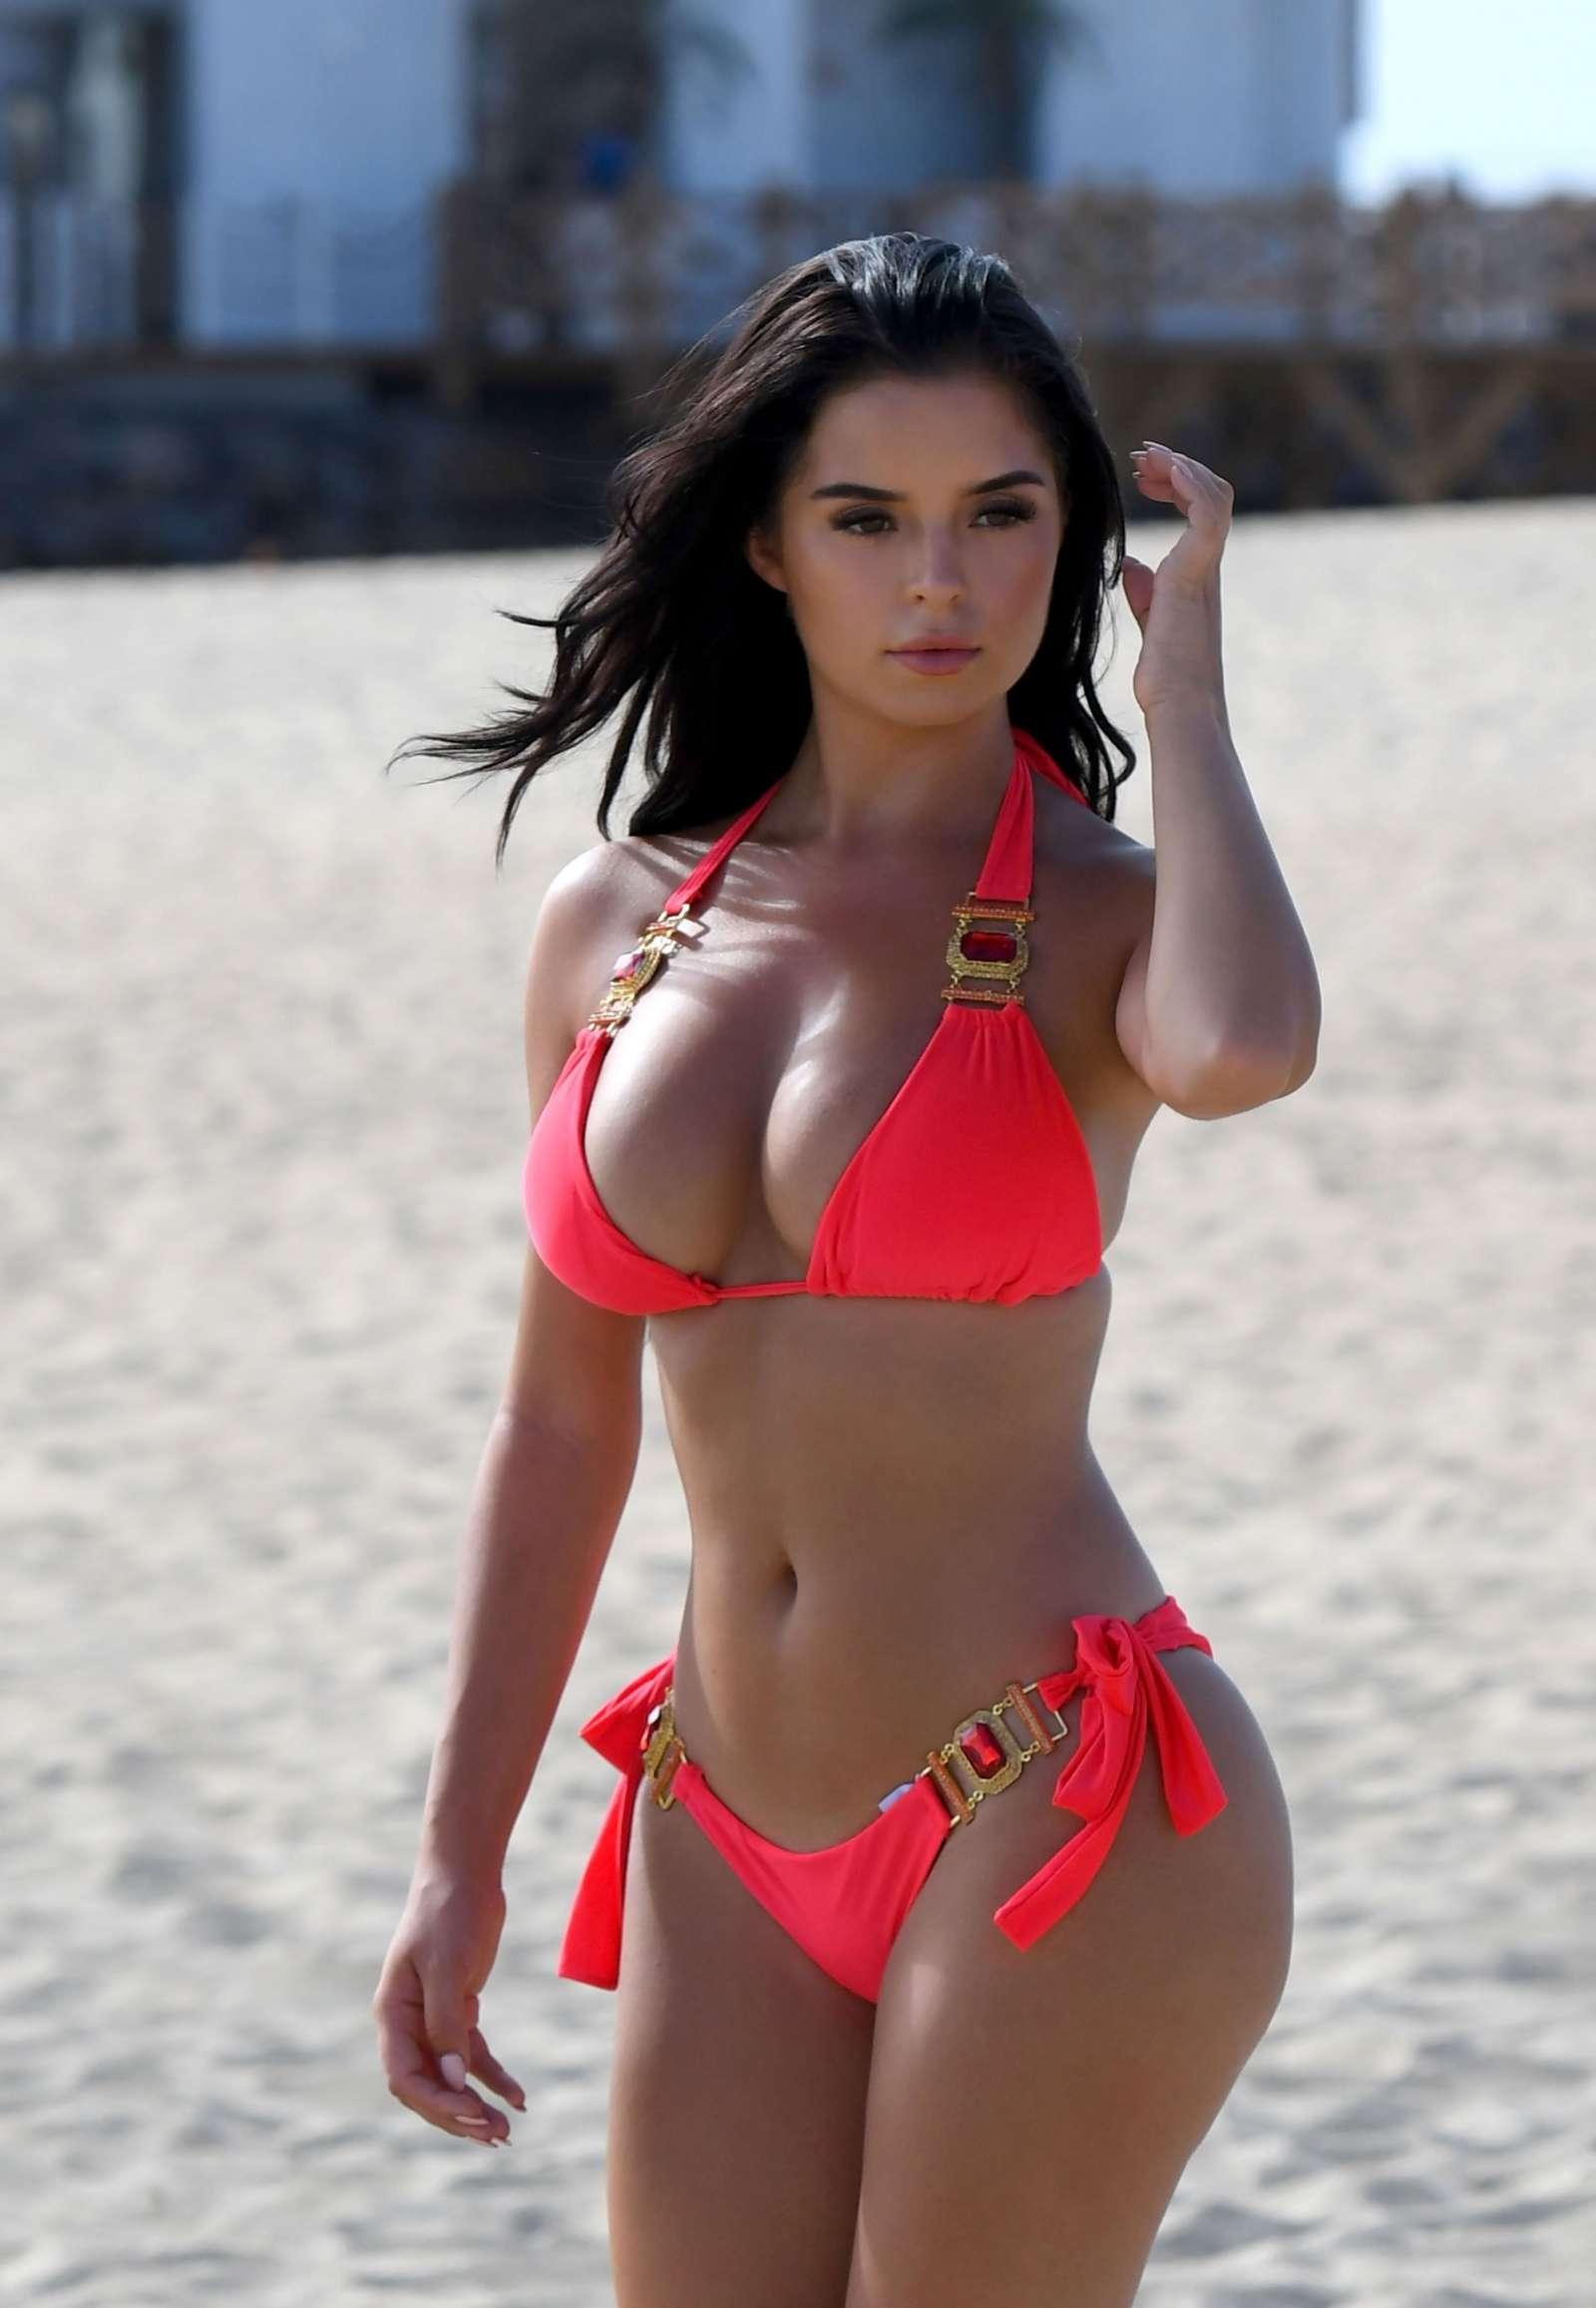 Demi Rose Mawby 2017 : Demi Rose Mawby: Hot In Bikini at Bikini Beach Club-10